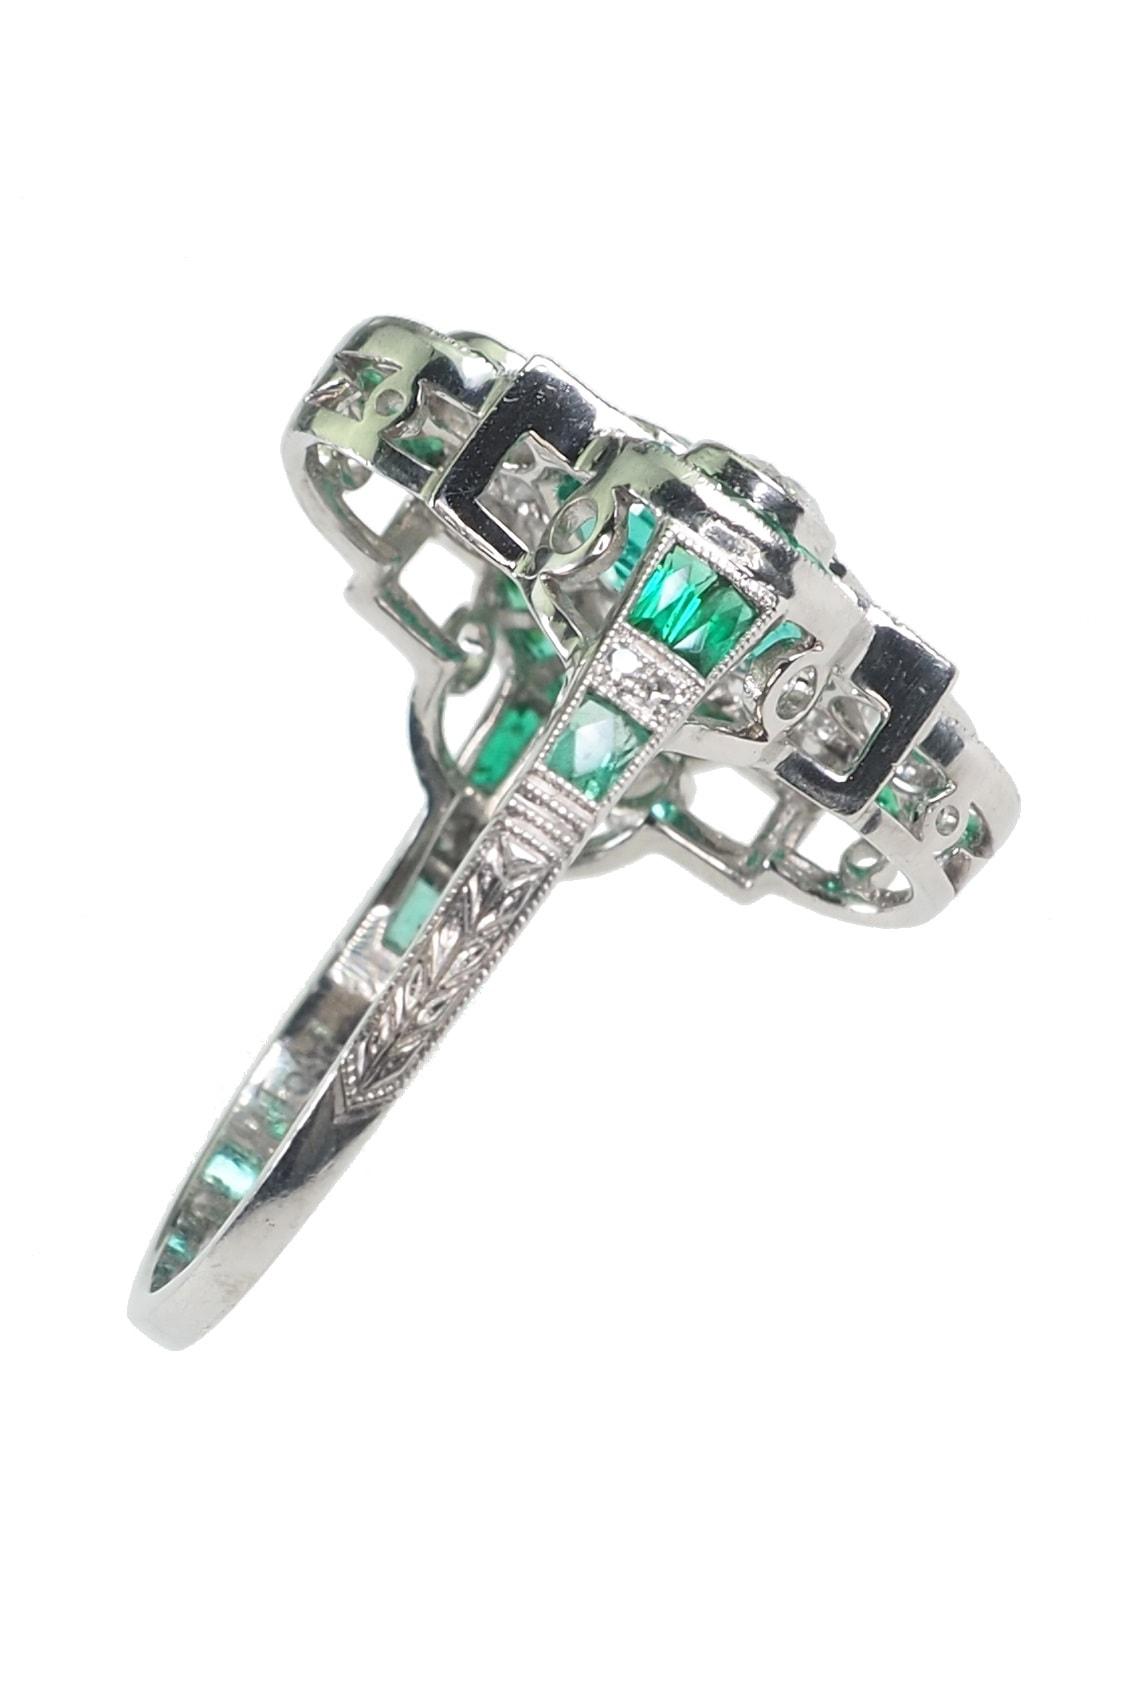 Art-deco-Smaragdring-kaufen-2698c